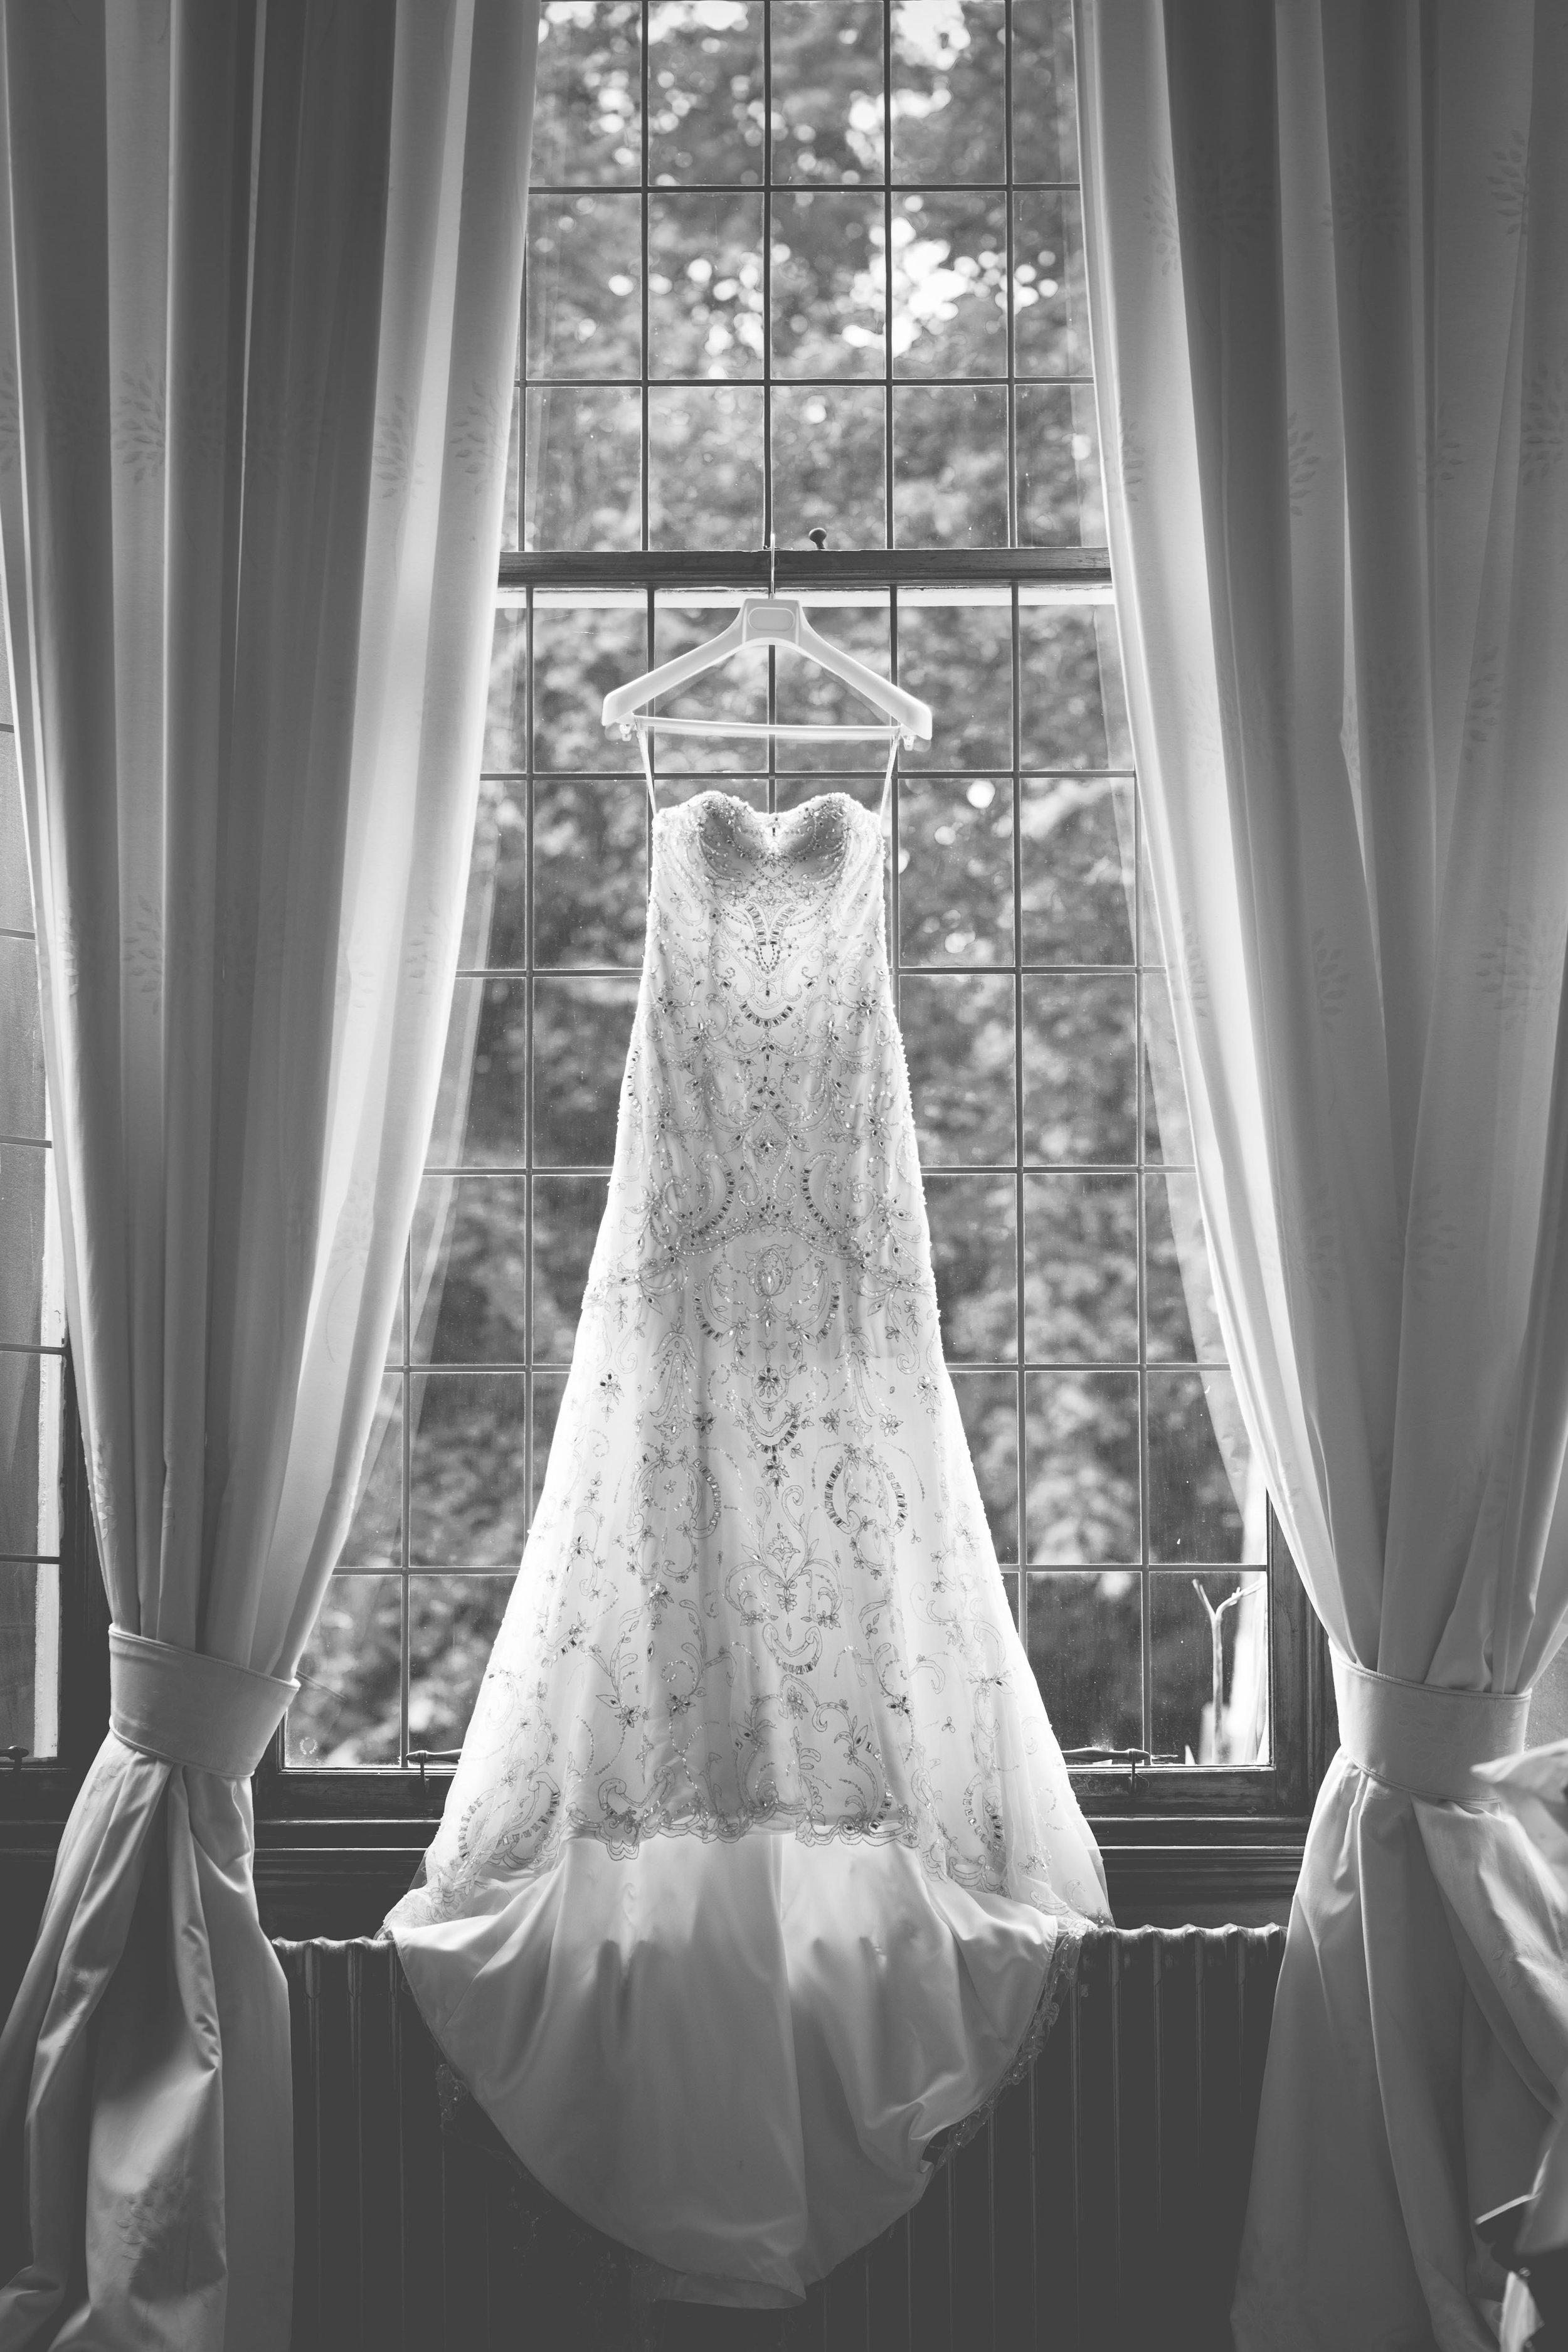 Northern Ireland Wedding Photographer | Brian McEwan Photography | Affordable Wedding Photography Throughout Antrim Down Armagh Tyrone Londonderry Derry Down Fermanagh -21.jpg